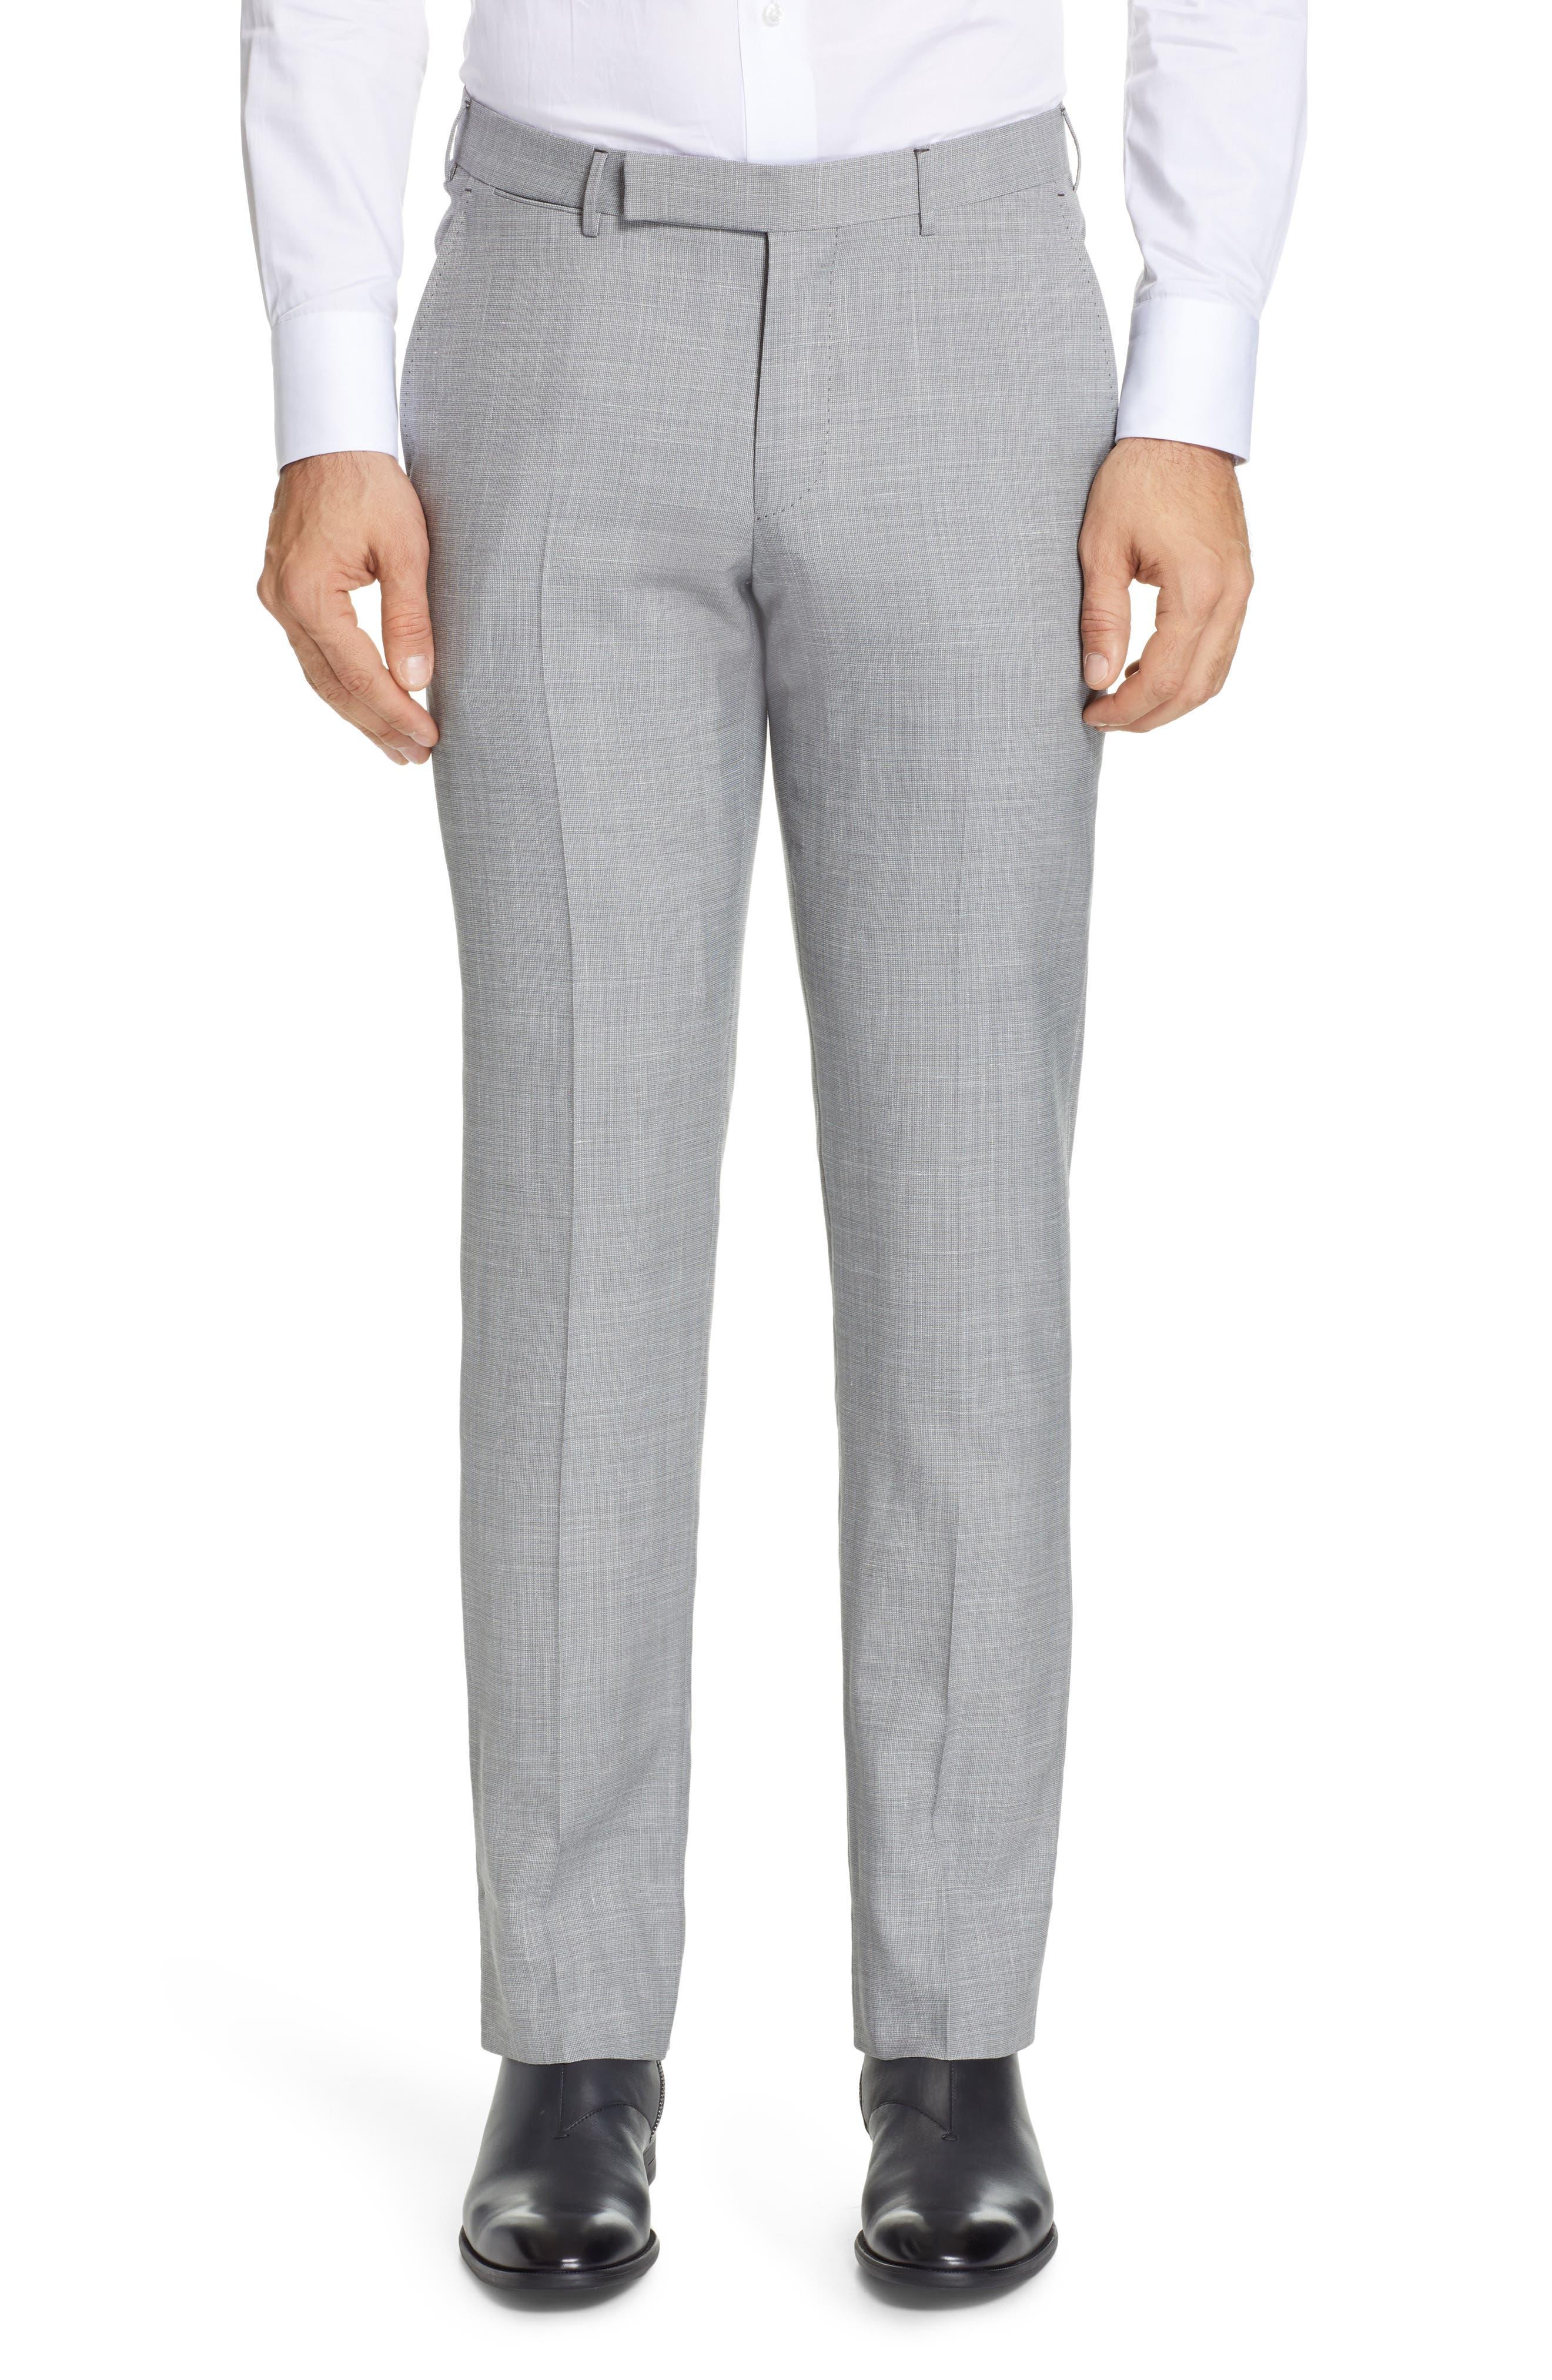 ERMENEGILDO ZEGNA Trofeo Flat Front Solid Wool Blend Trousers, Main, color, LIGHT GREY